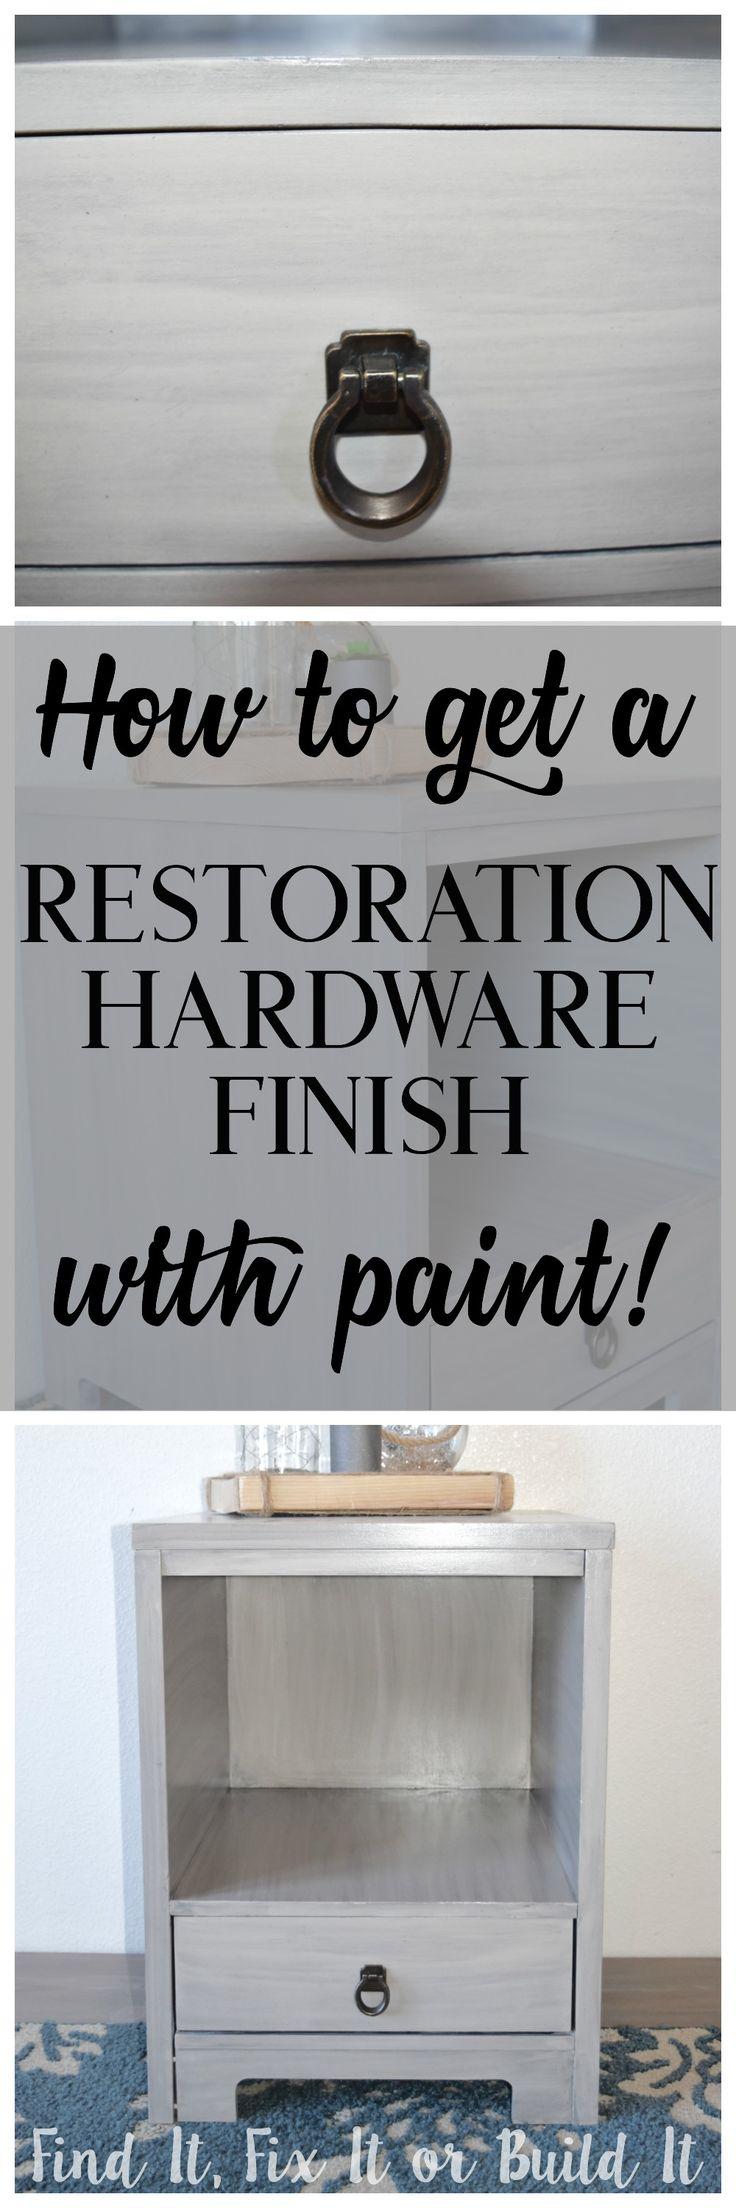 Best 25 Restoration Hardware Paint Ideas On Pinterest Restoration Hardware Furniture